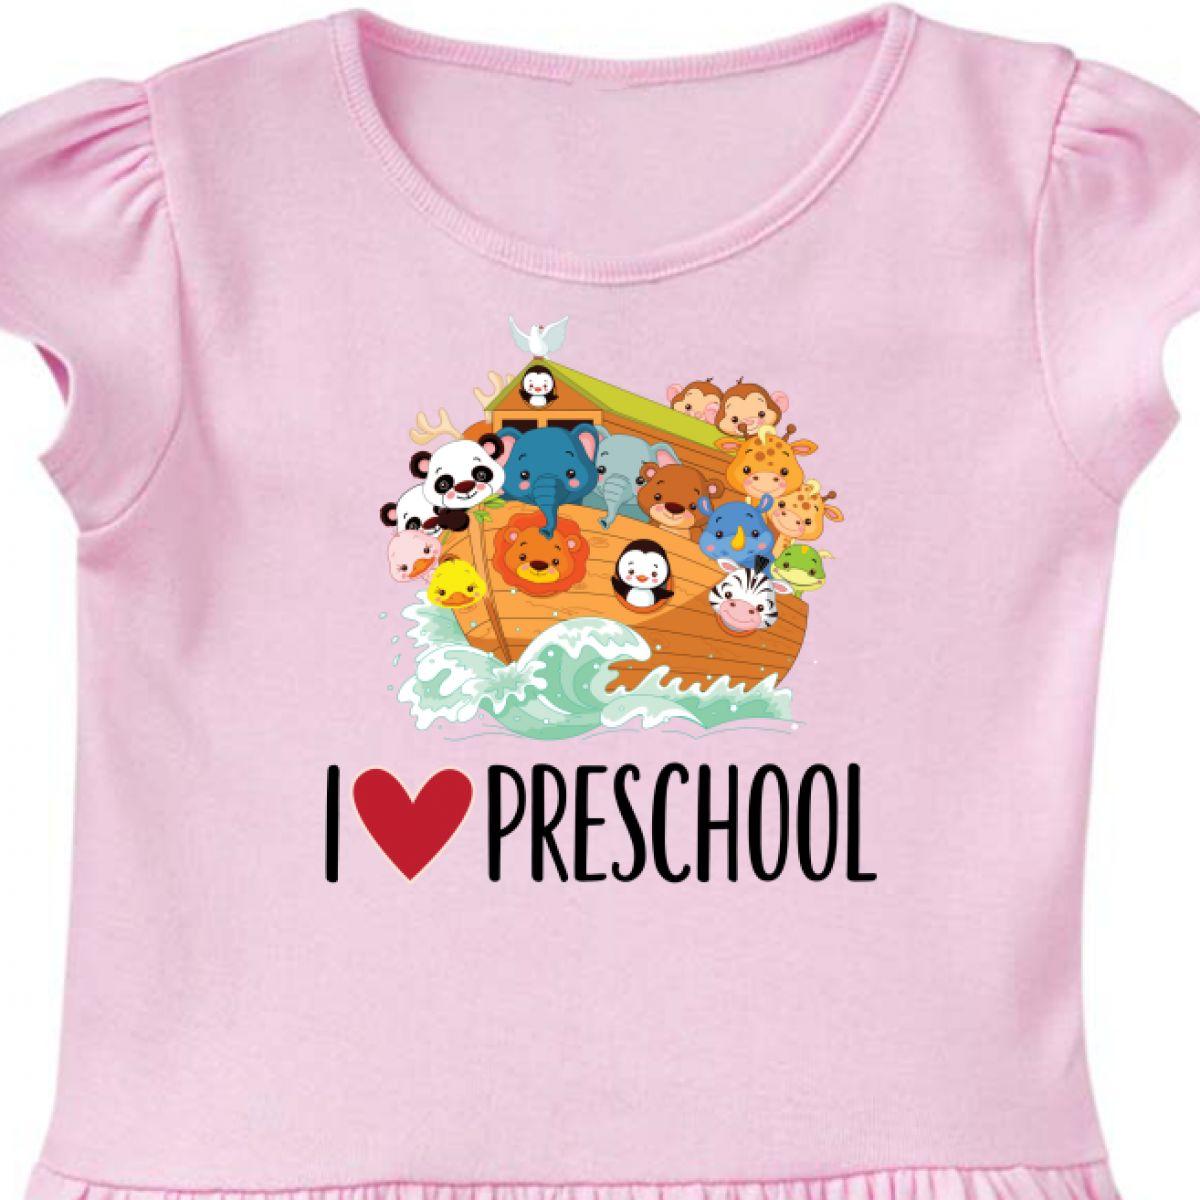 inktastic Wee Lassie Toddler T-Shirt